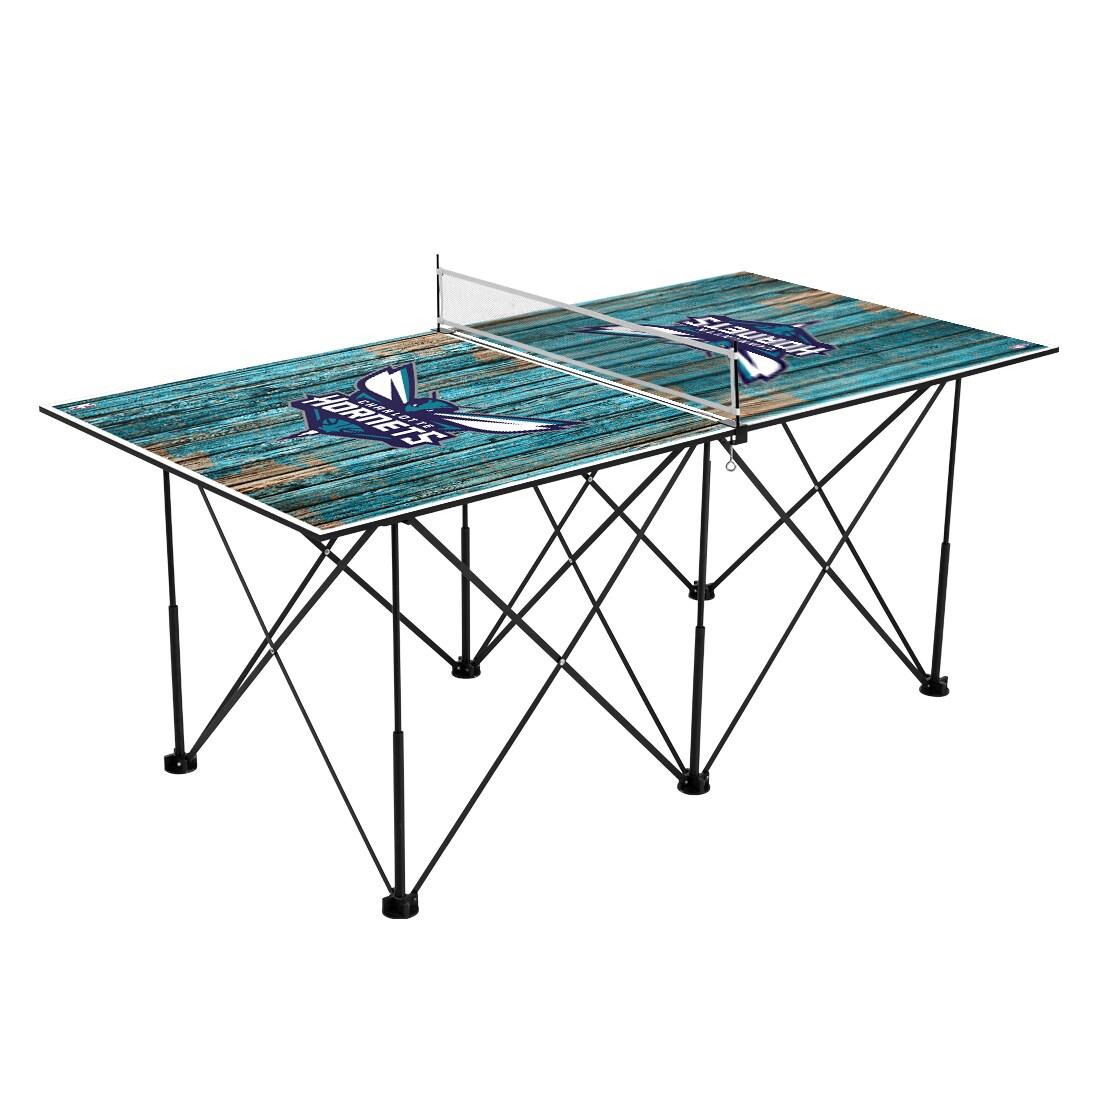 Charlotte Hornets 6' Weathered Design Pop Up Table Tennis Set